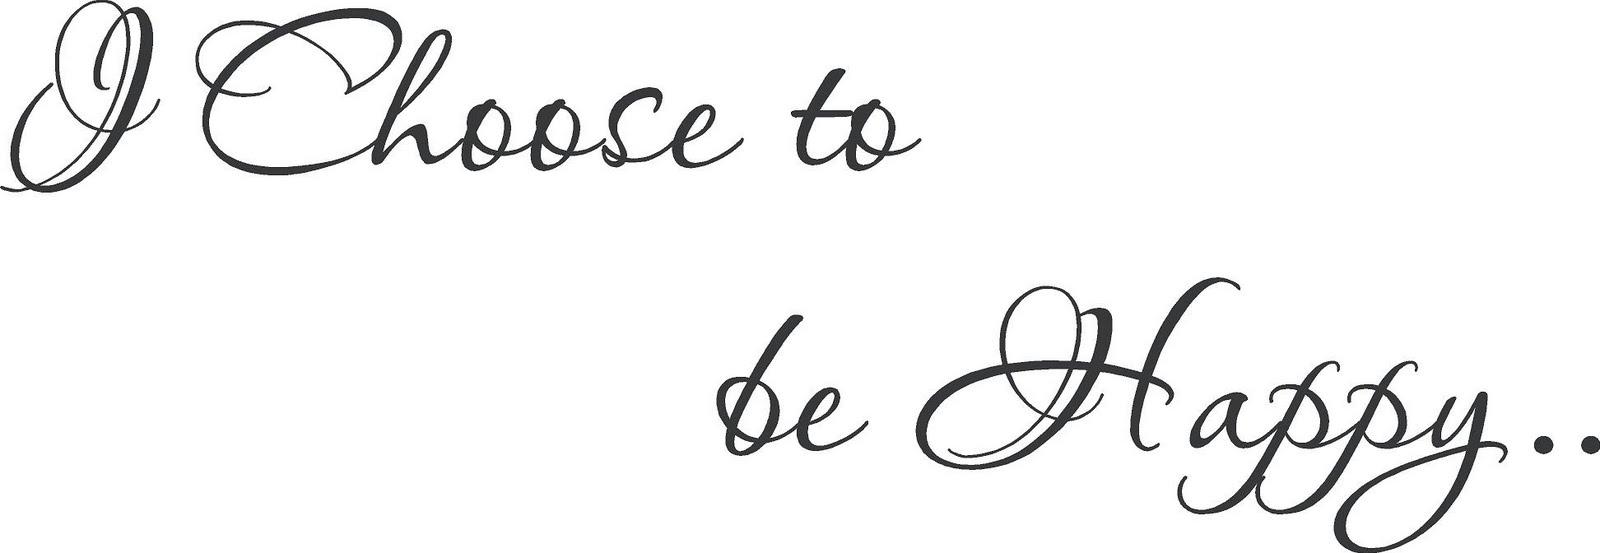 Choose To Be Happy Quotes choose to be happy quotes [2]   Quotes links Choose To Be Happy Quotes